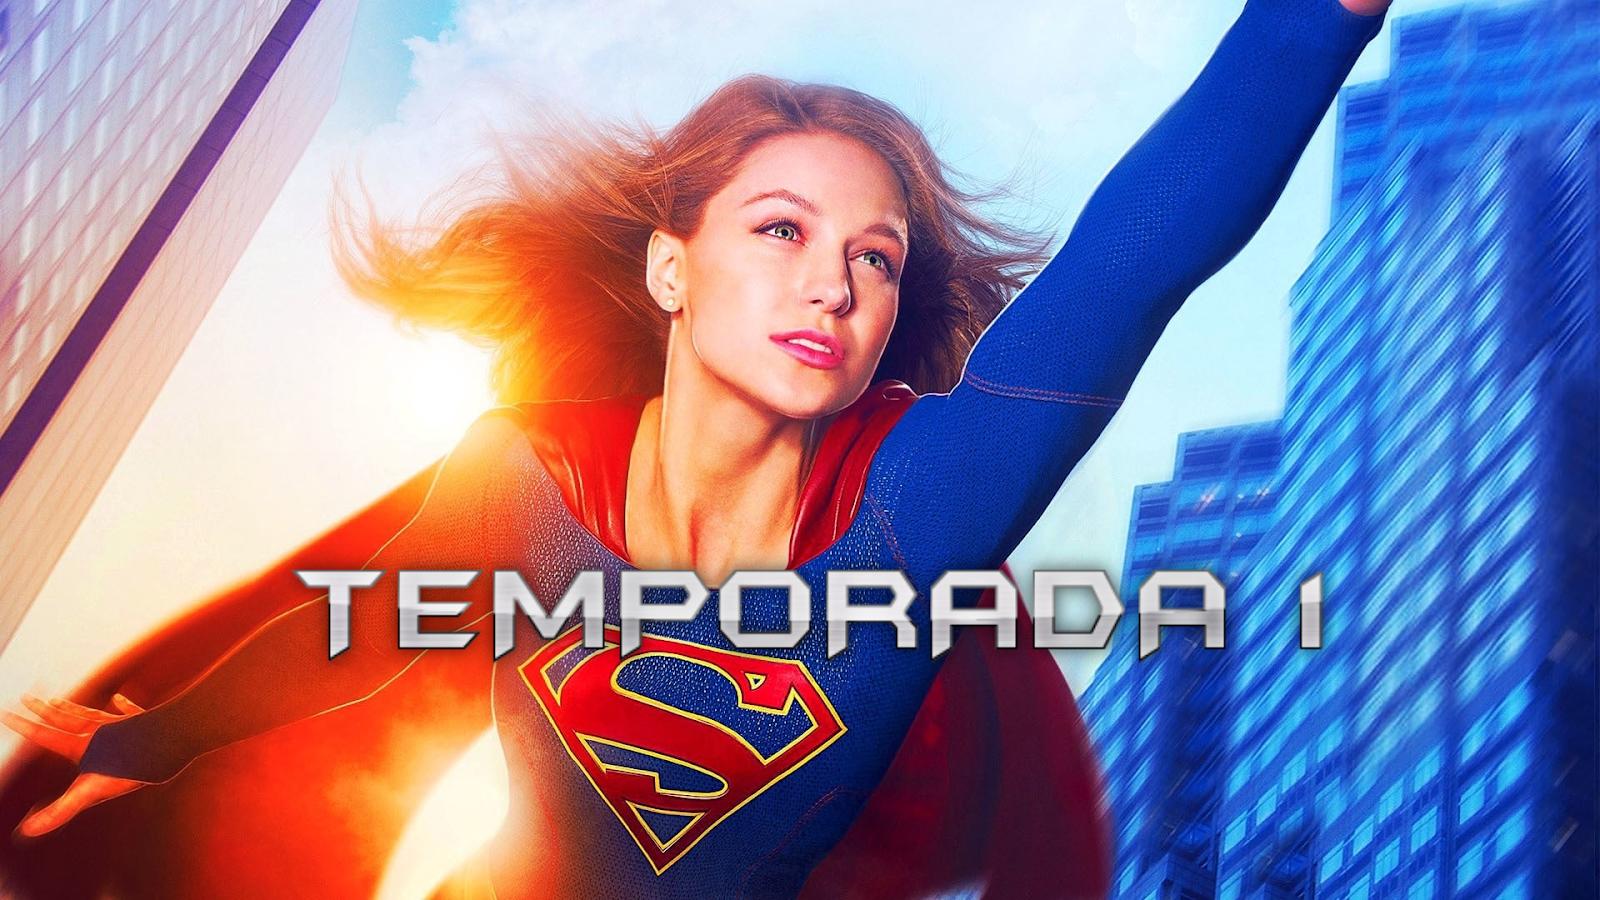 Supergirl (TEMPORADA 1) HD 1080P LATINO/INGLES